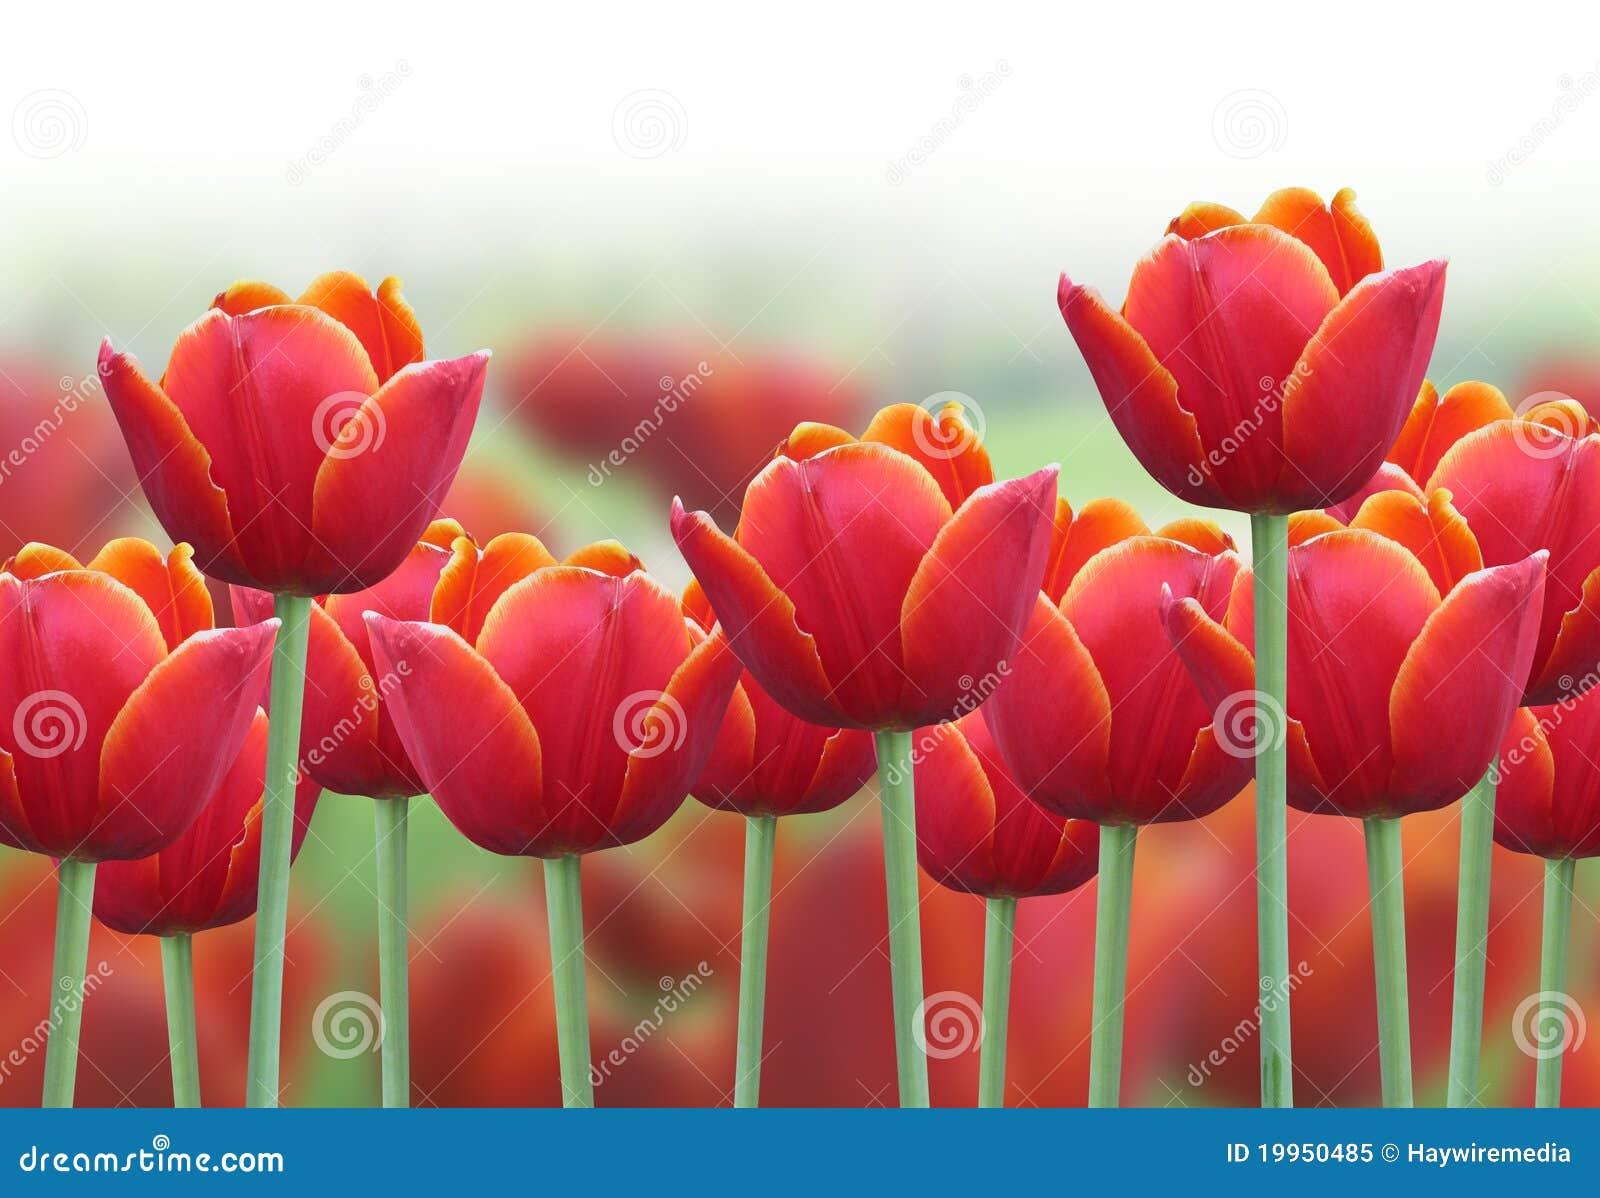 Frühlings-Tulpe-Blumen-Hintergrund